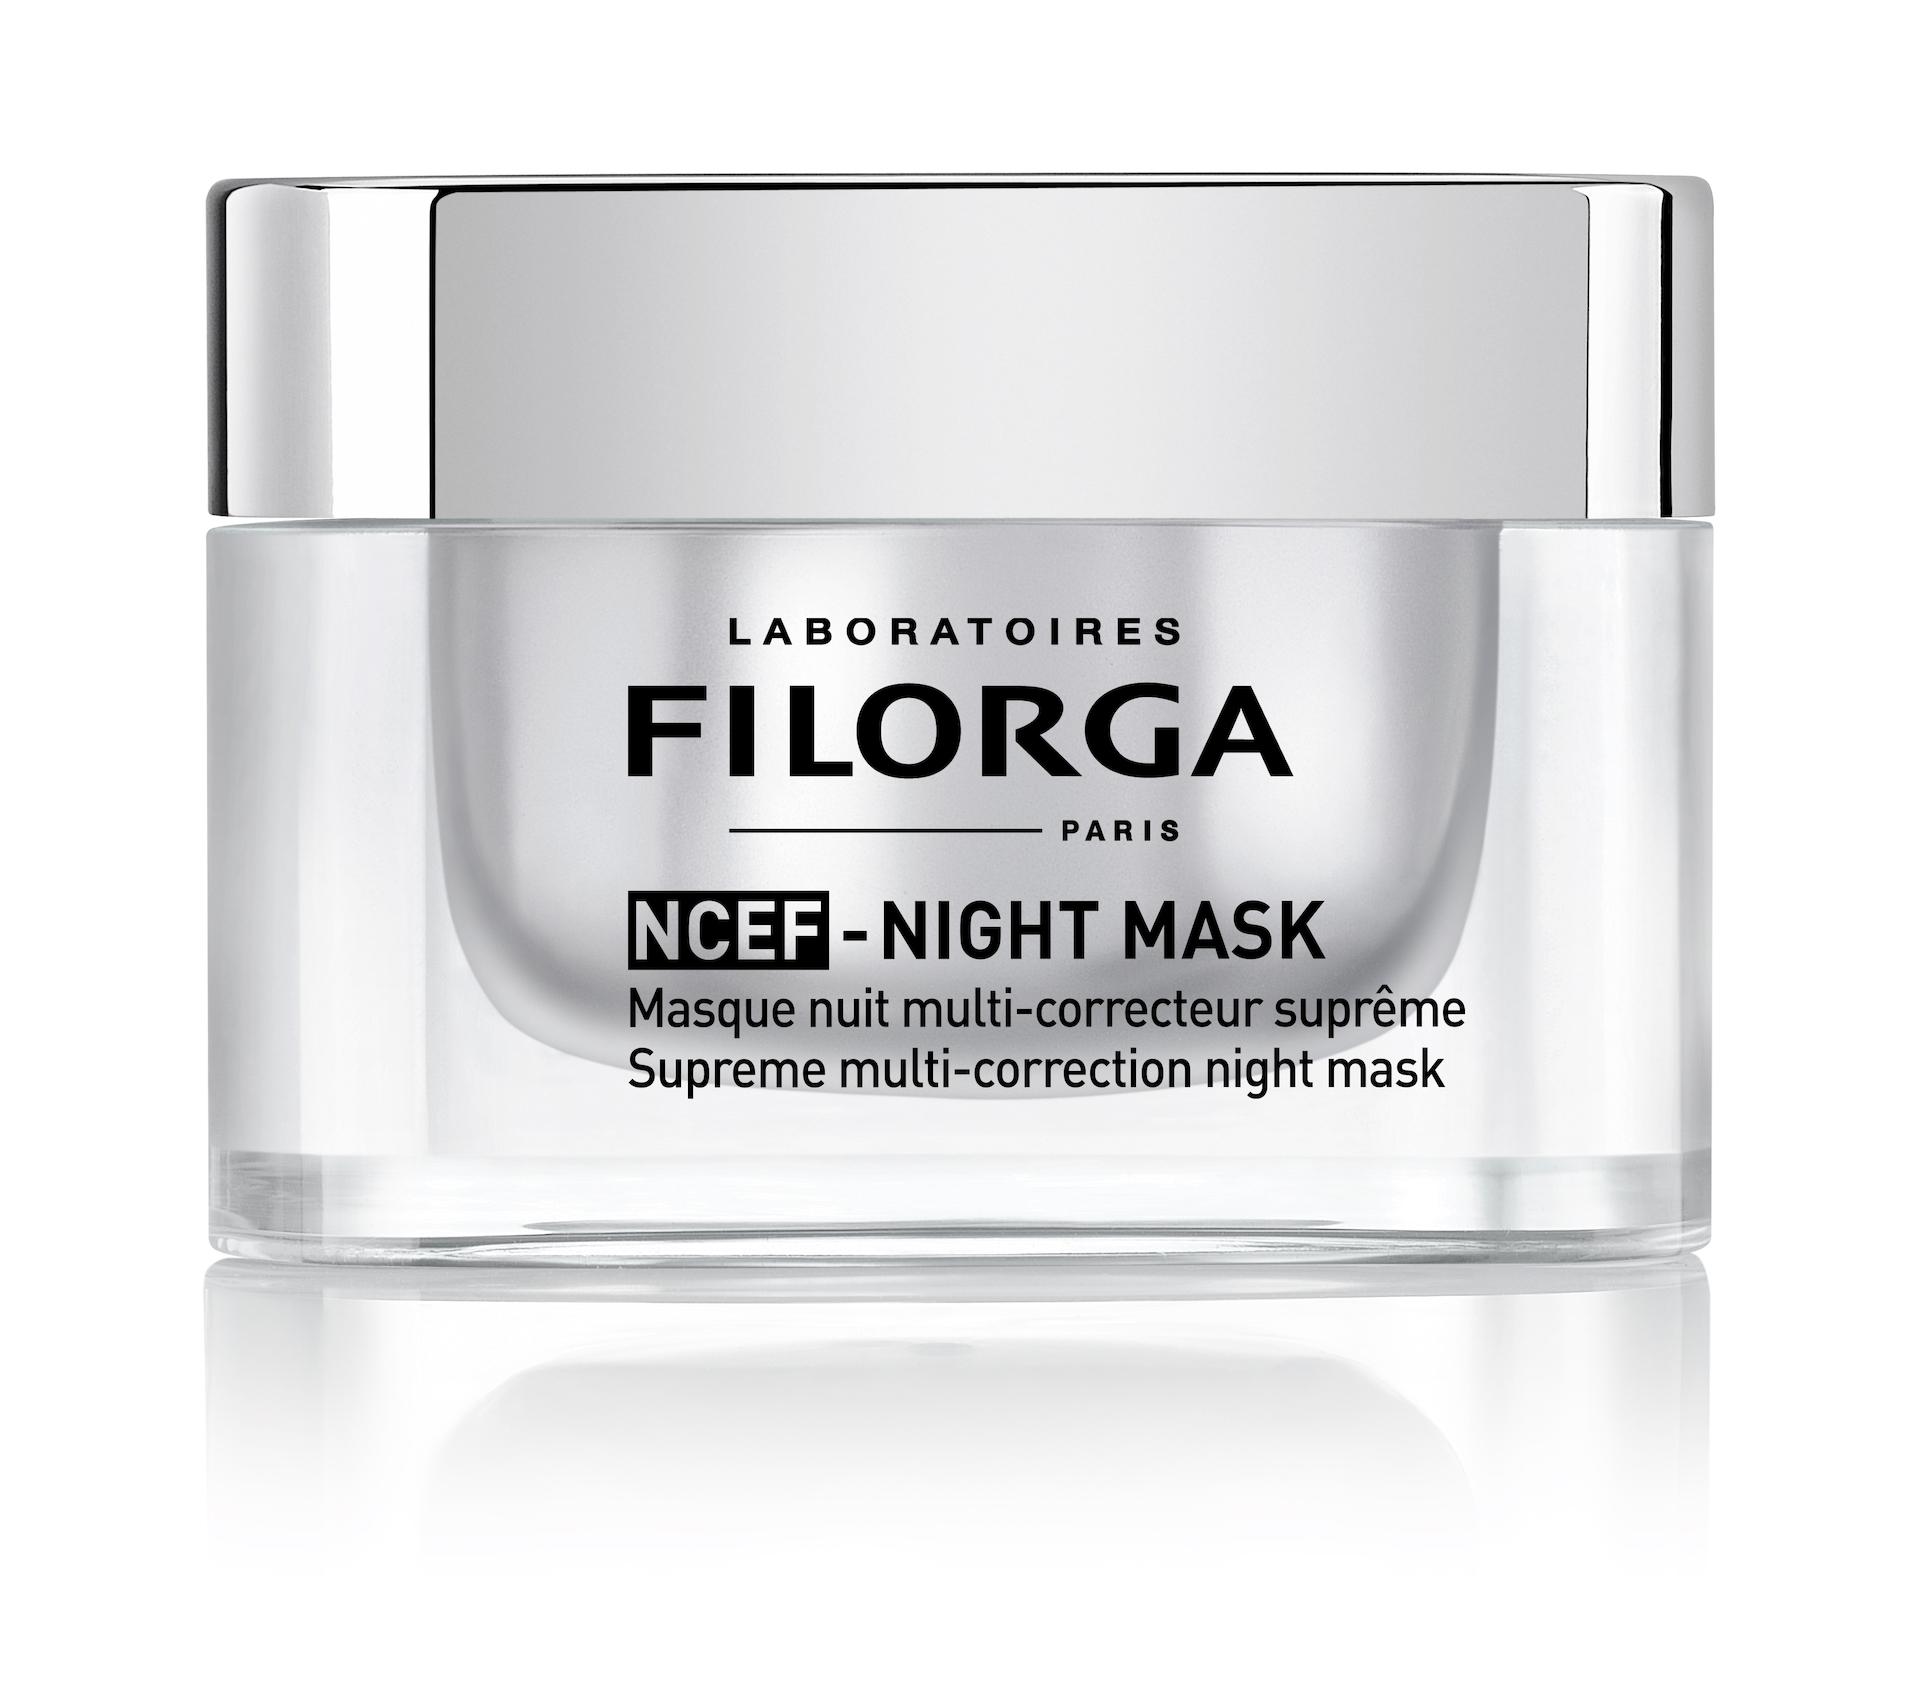 NCEF-Night Mask